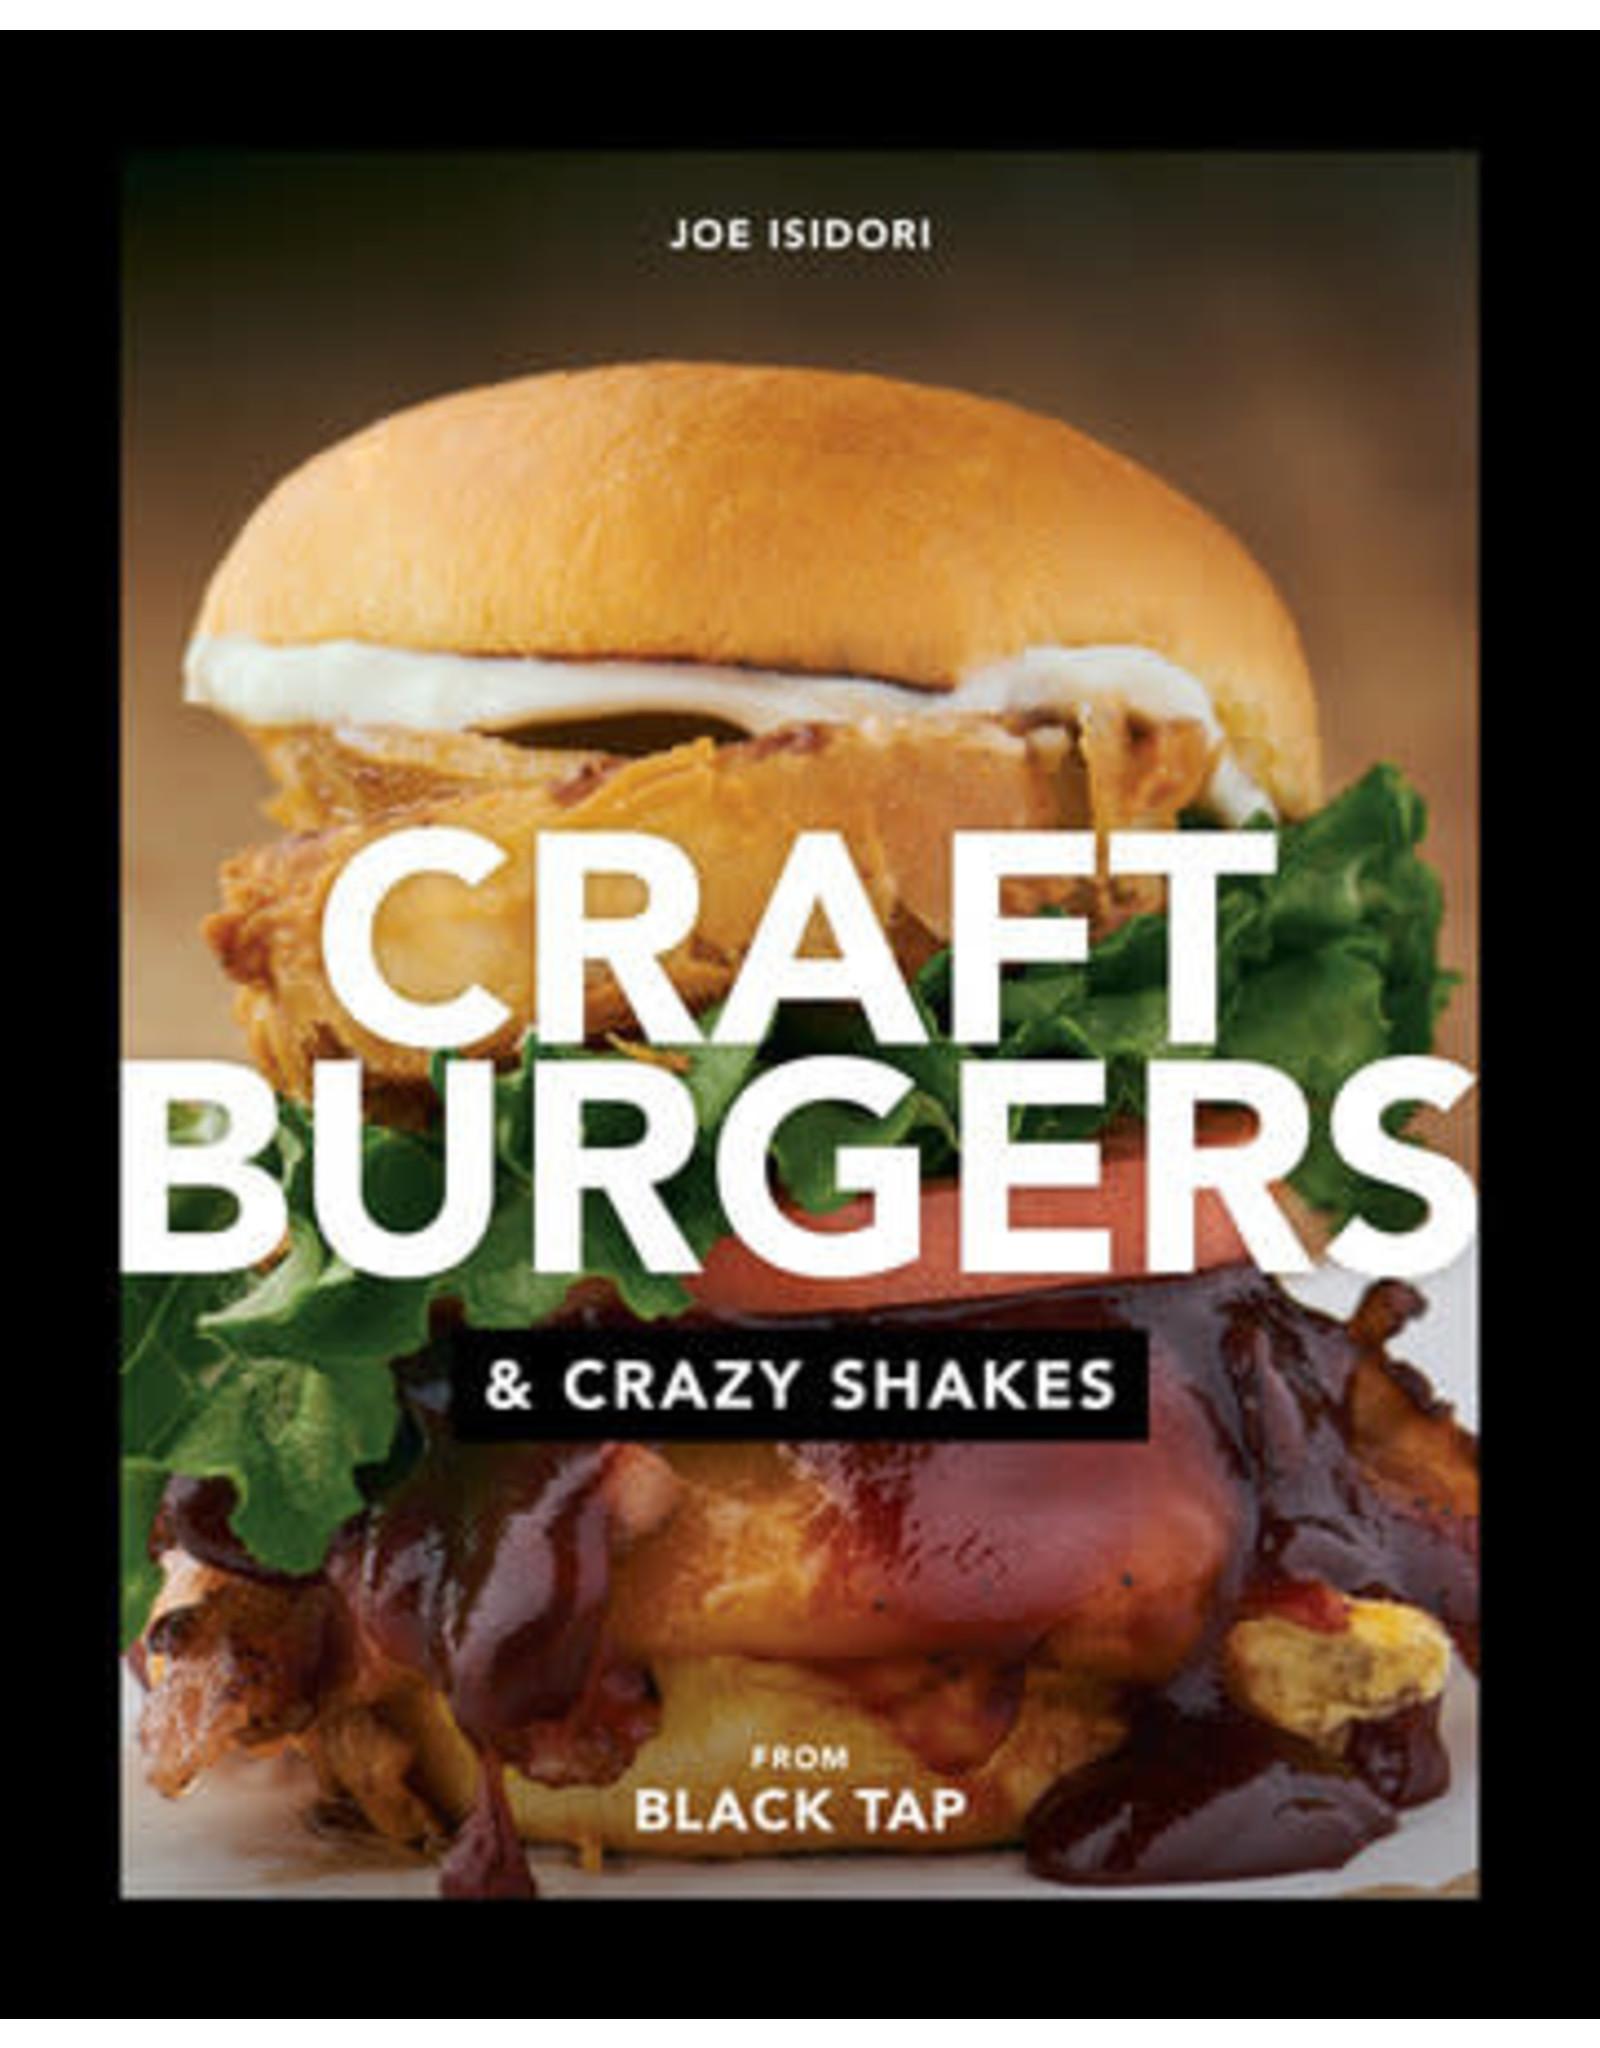 Craft Burgers & Crazy Shakes